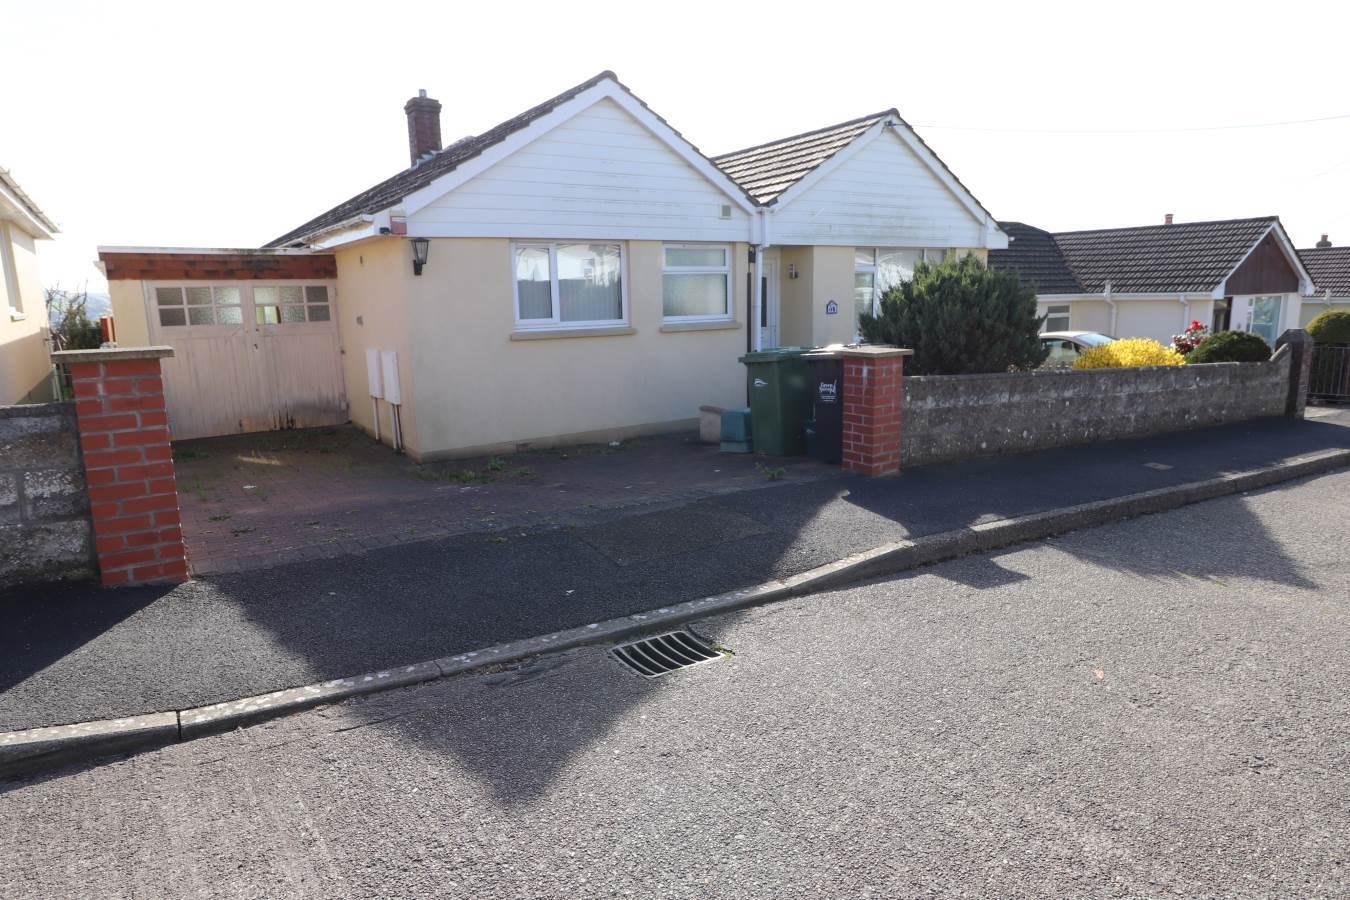 Fine 3 Bedroom Property For Sale In Barnstaple North Devon Beutiful Home Inspiration Aditmahrainfo